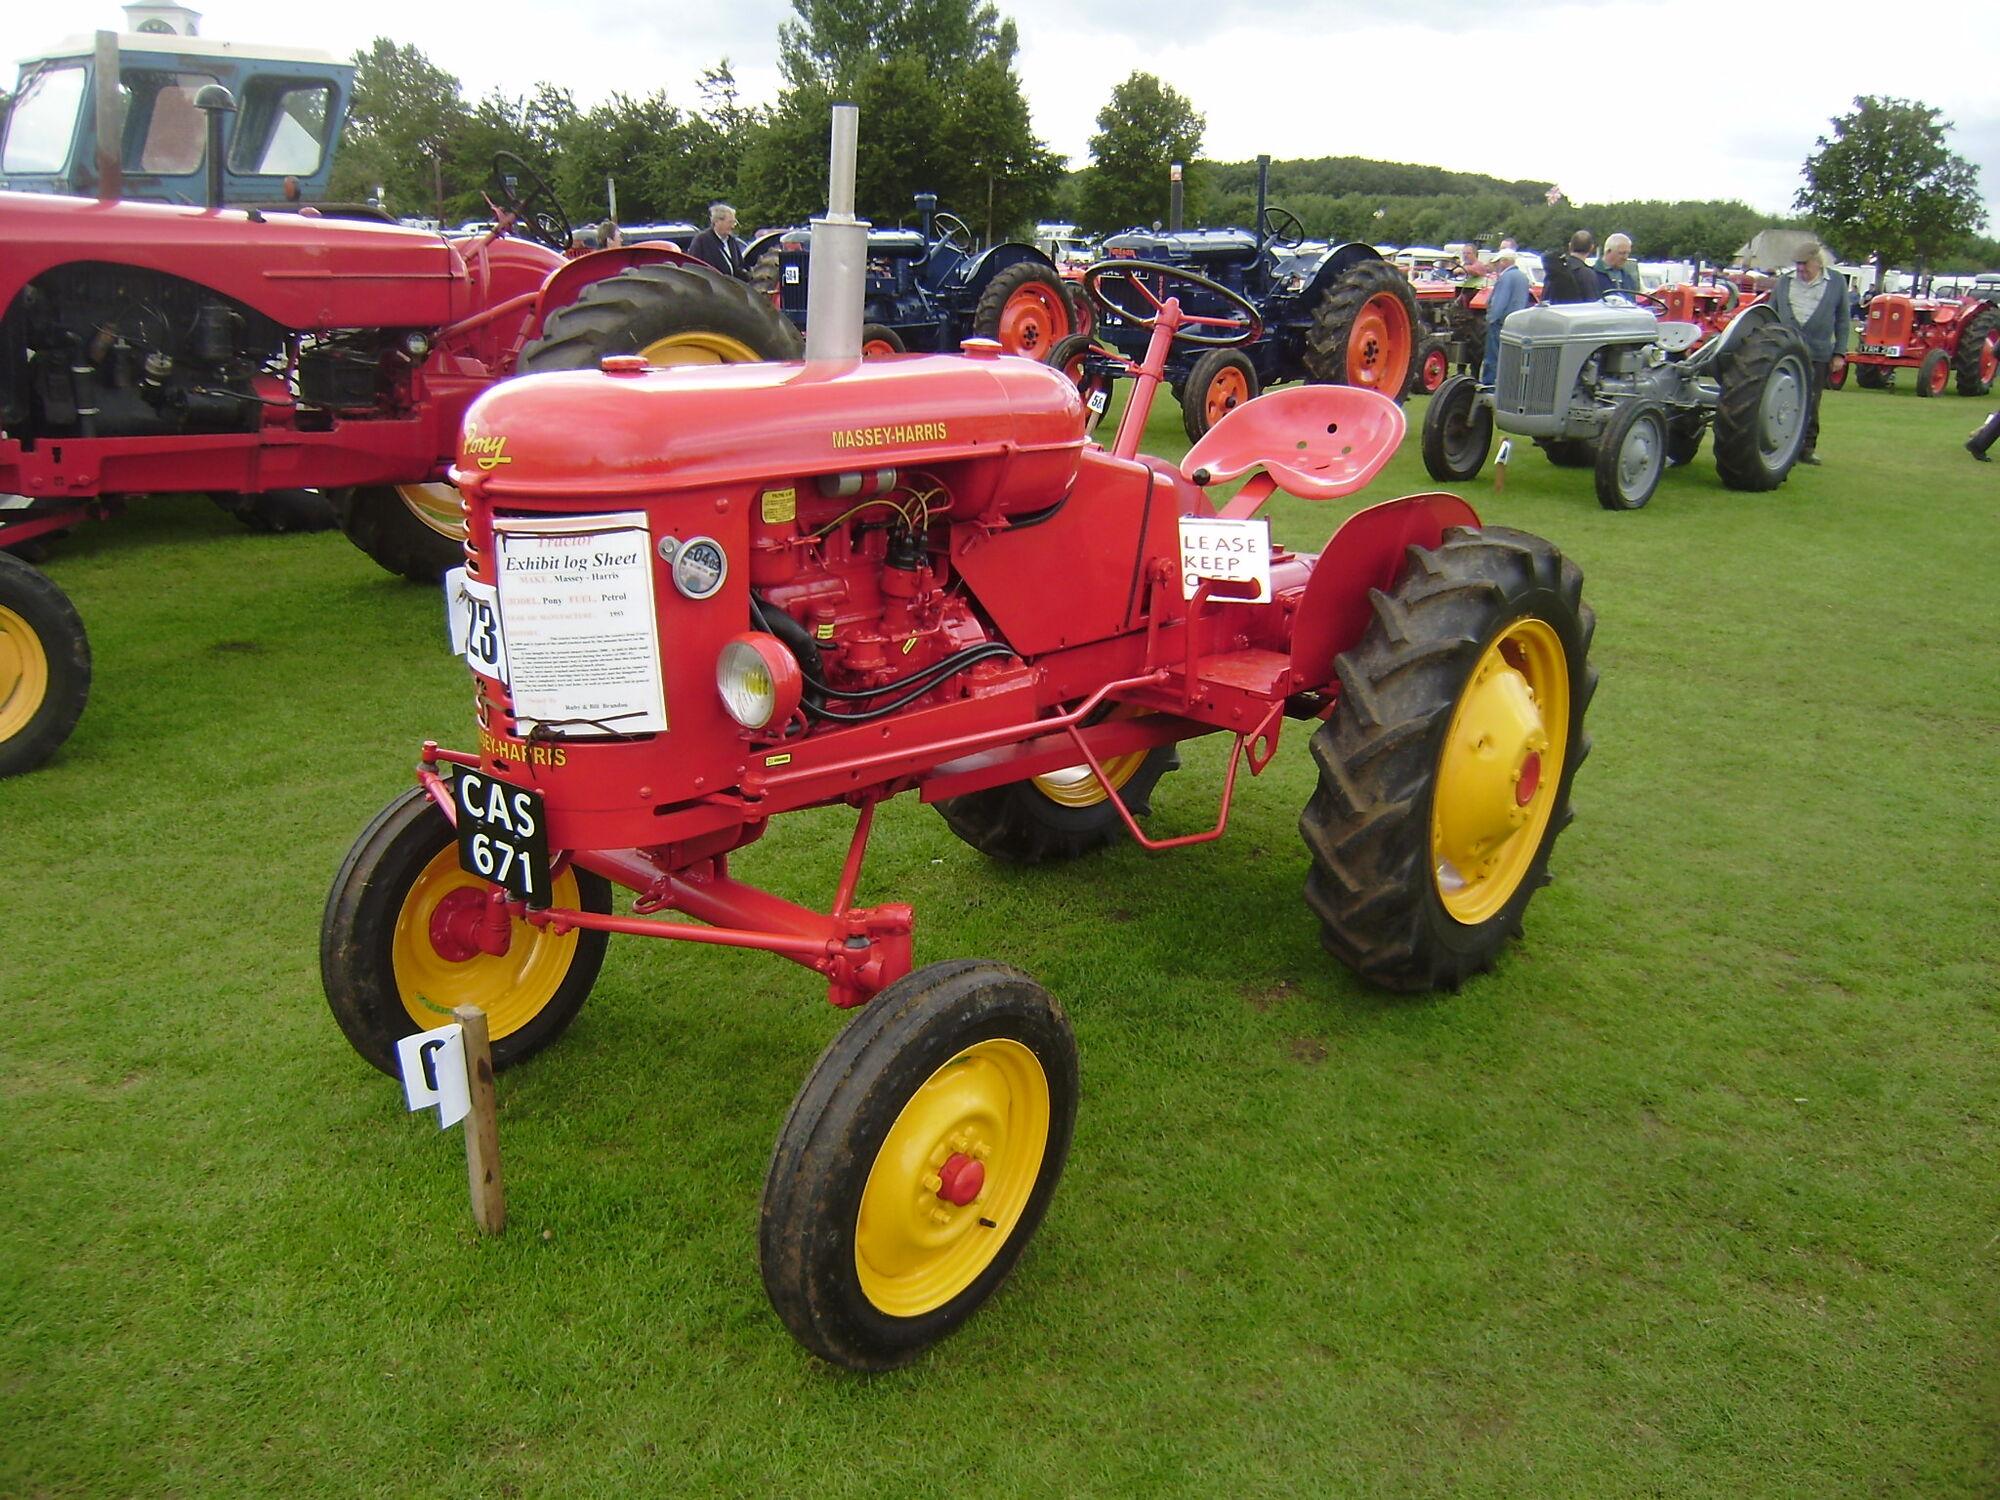 Massey Harris Tractor : Massey harris pony tractor construction plant wiki